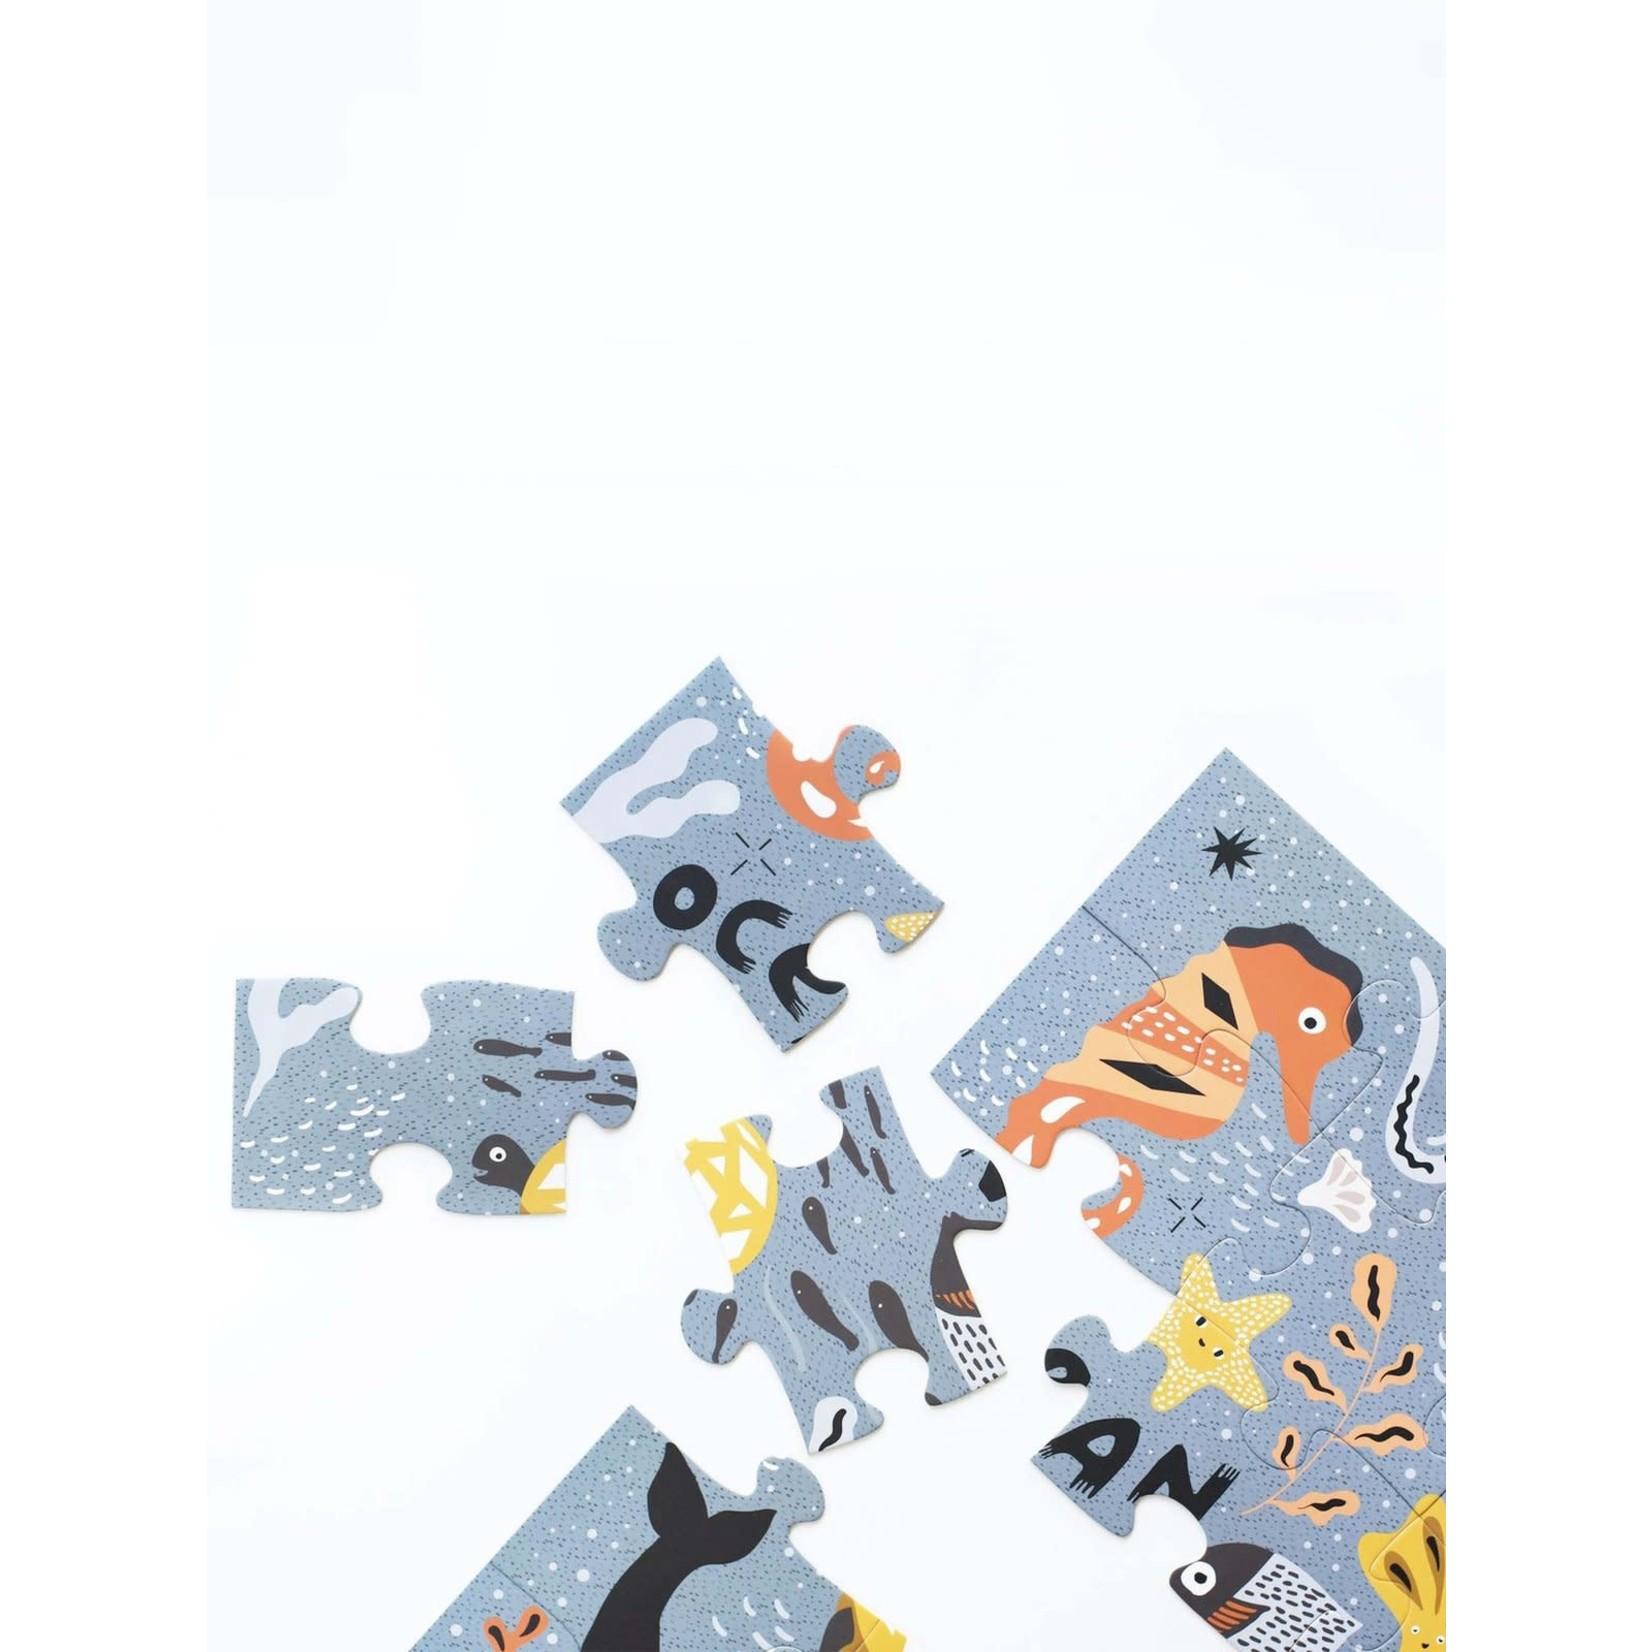 Ocean Life Floor Puzzle